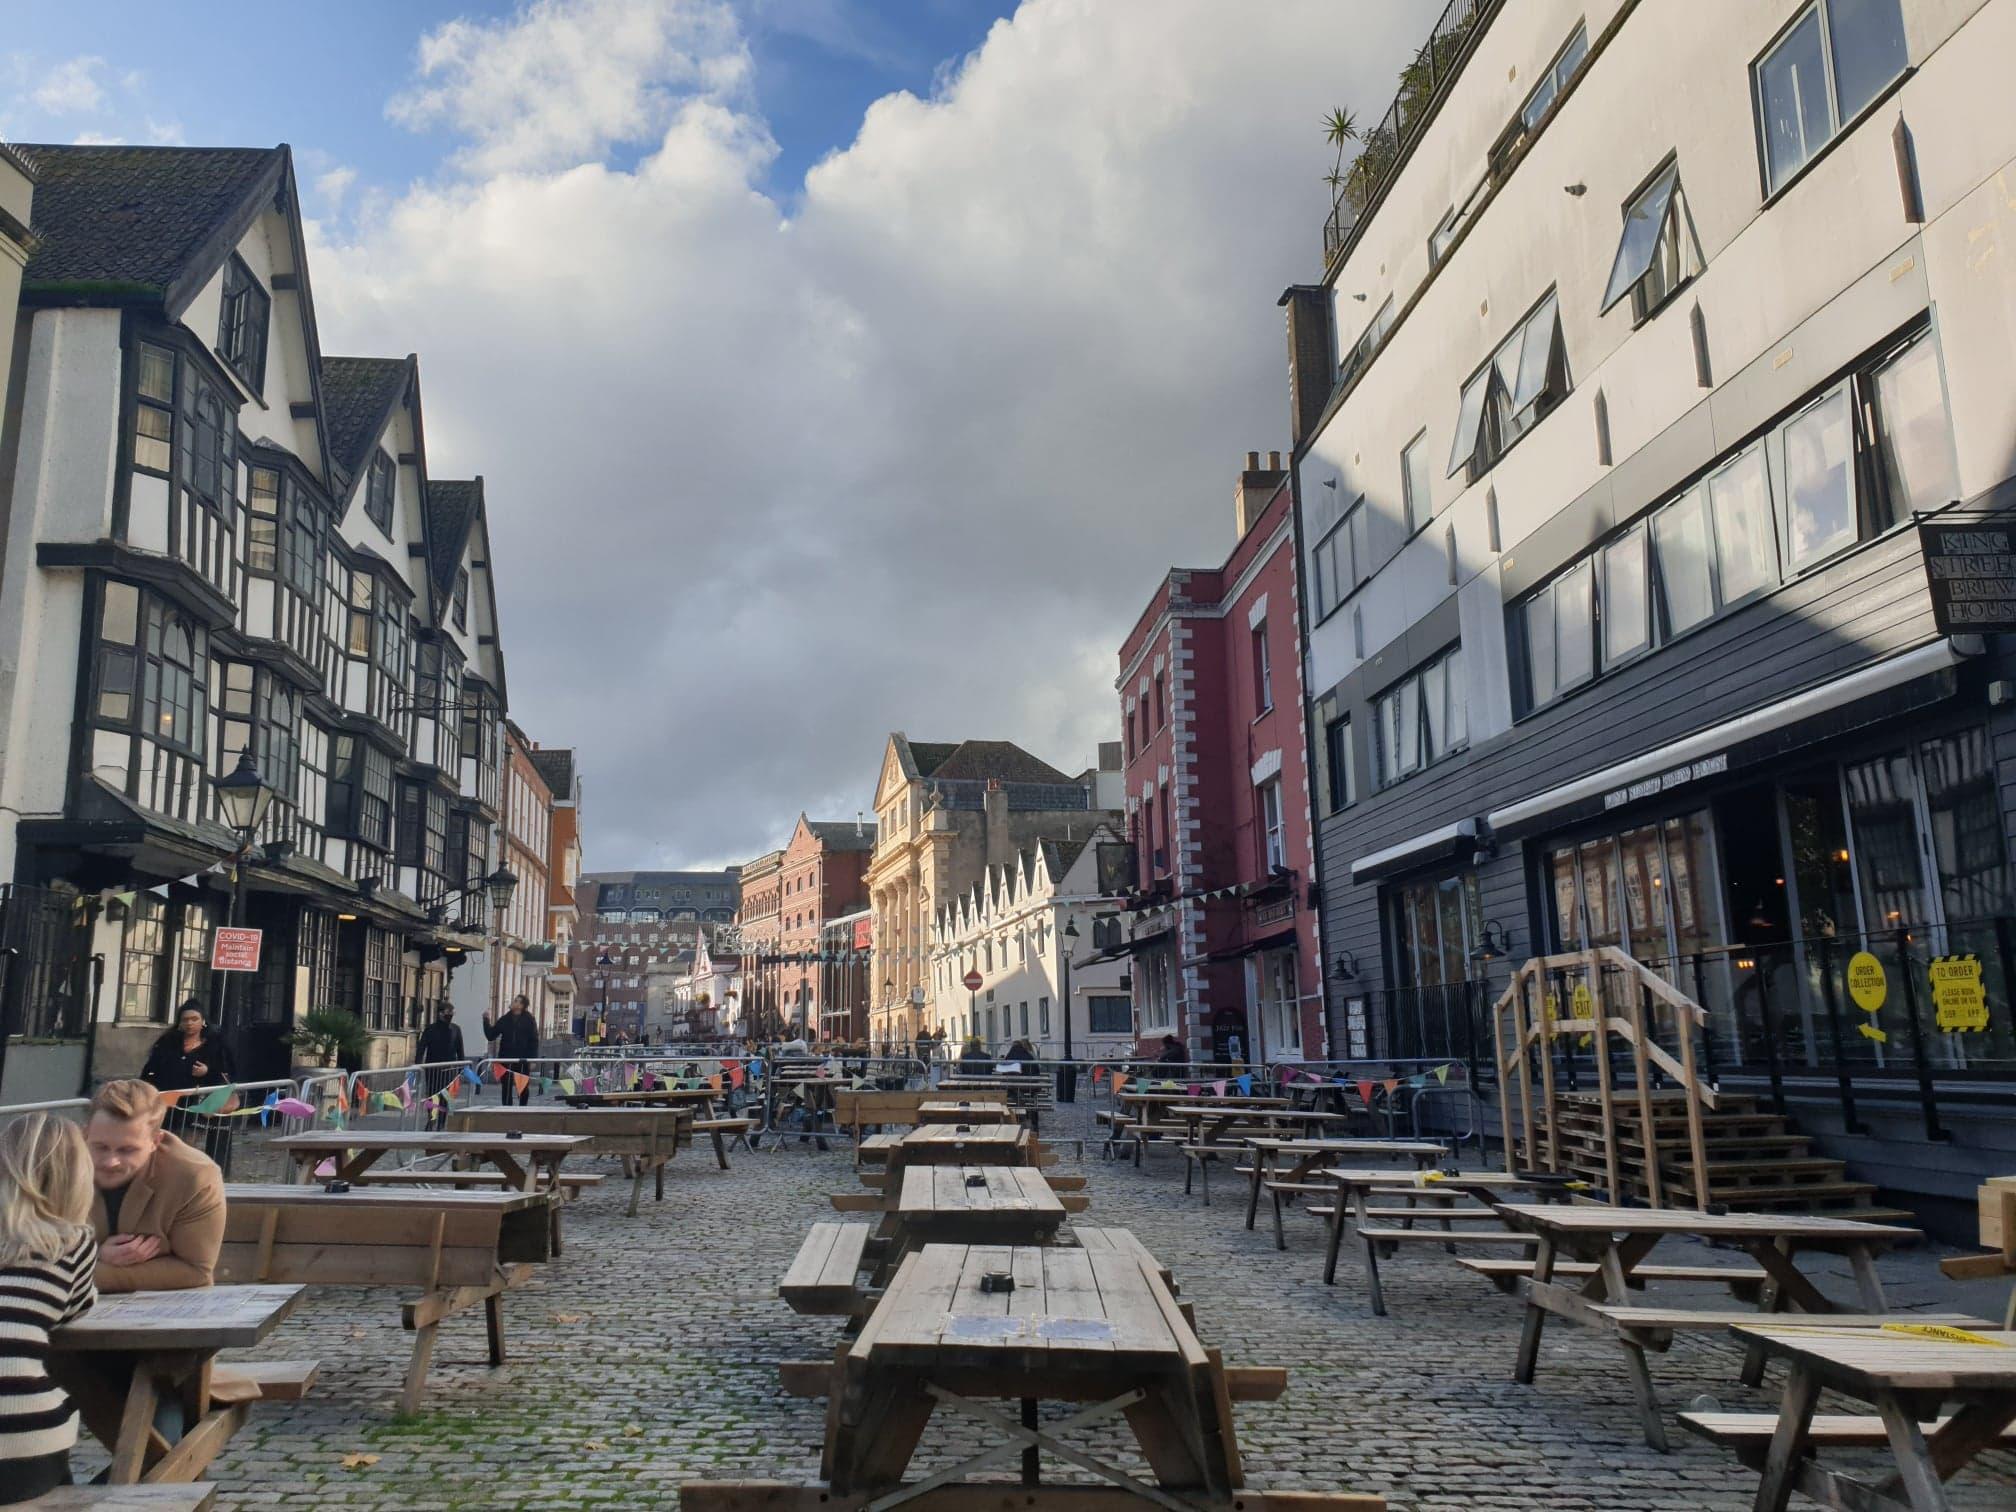 Pubs in King Street, Central Bristol